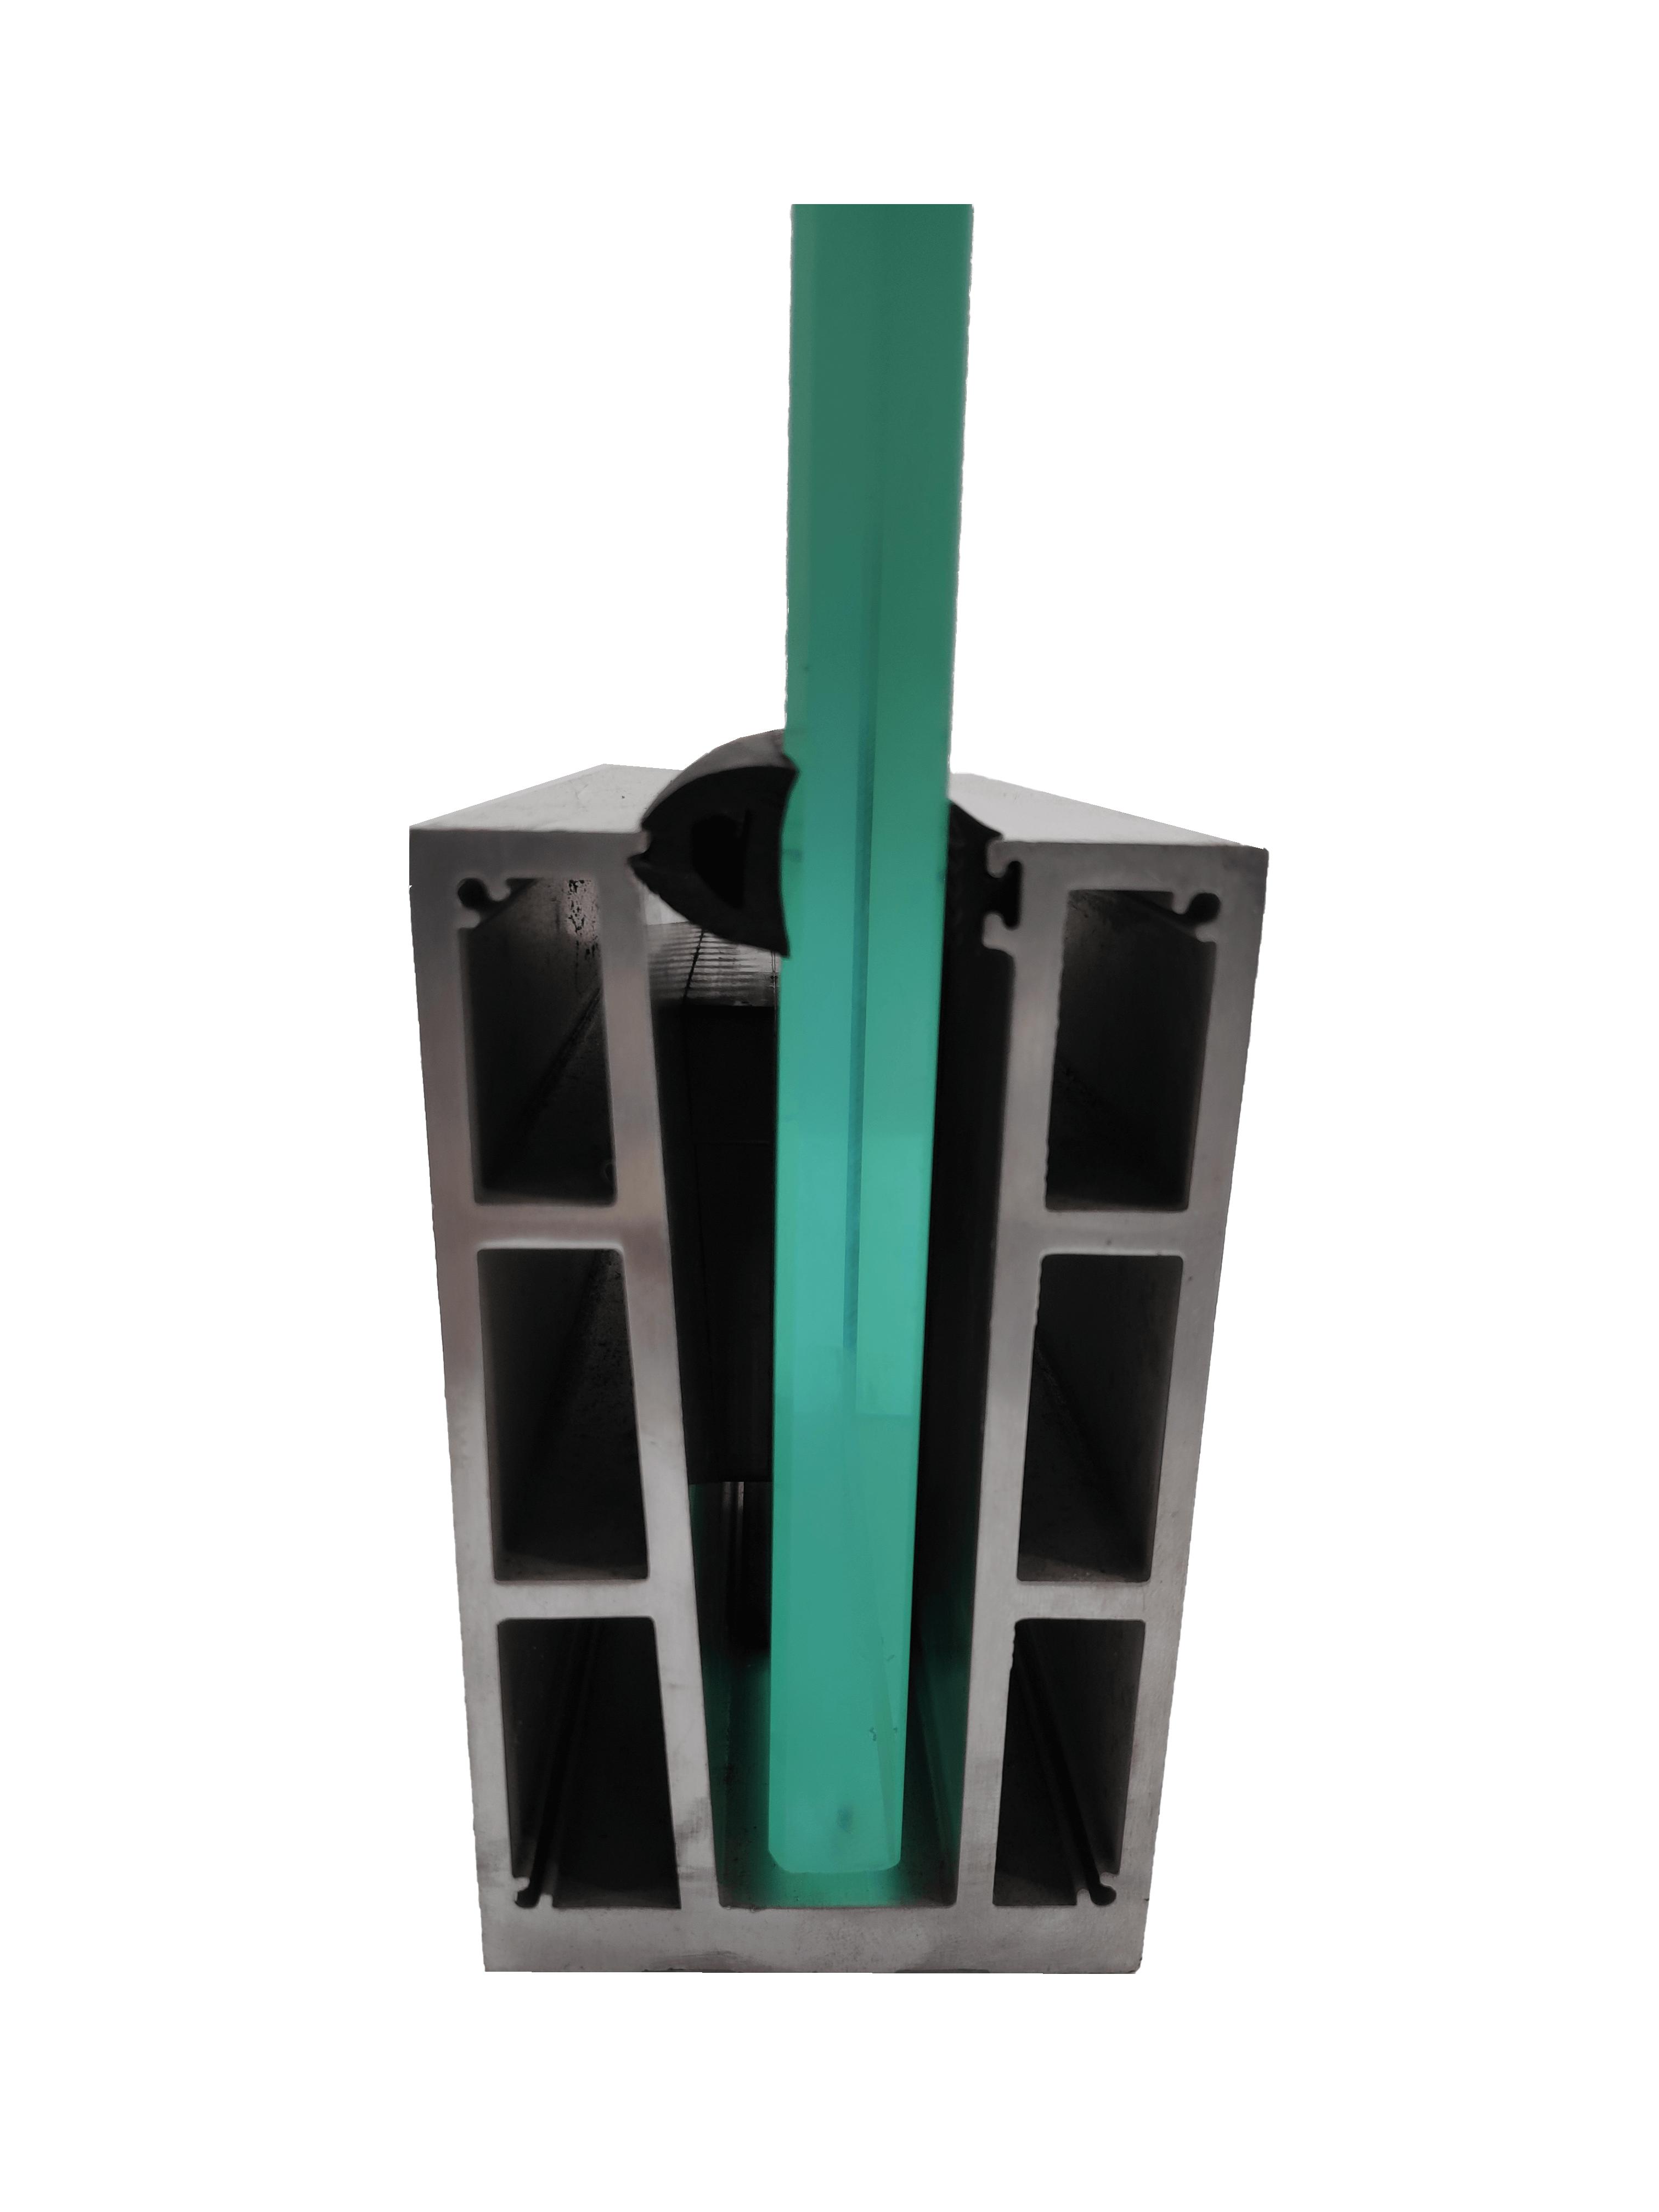 75x125mm Aluminium channel